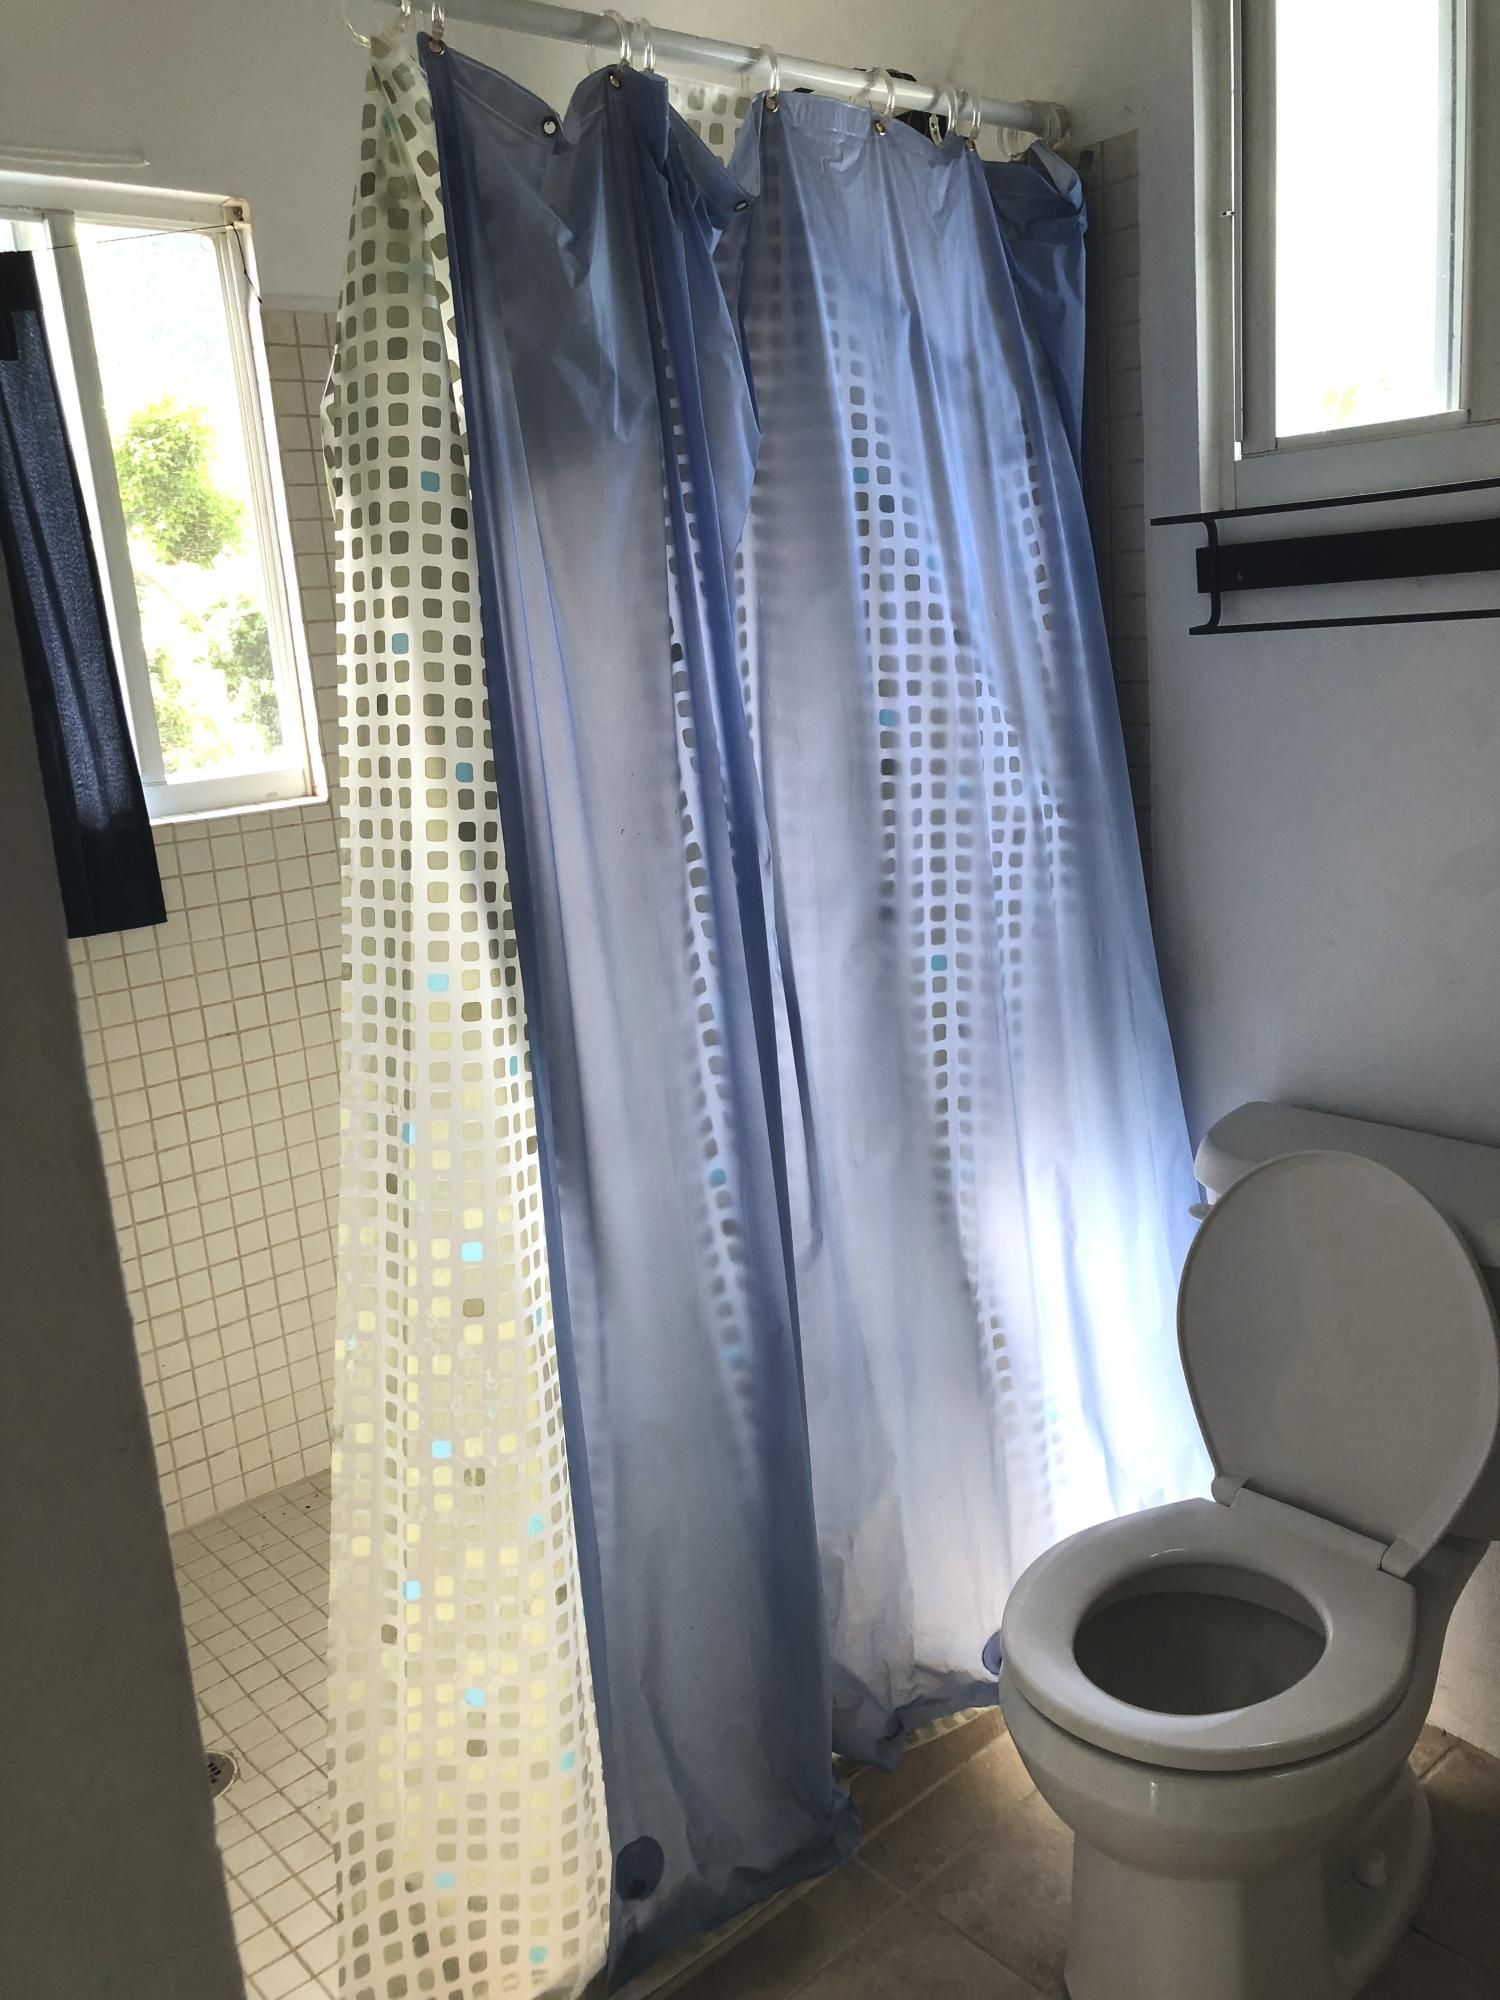 East Upper Apartment Bathroom 1